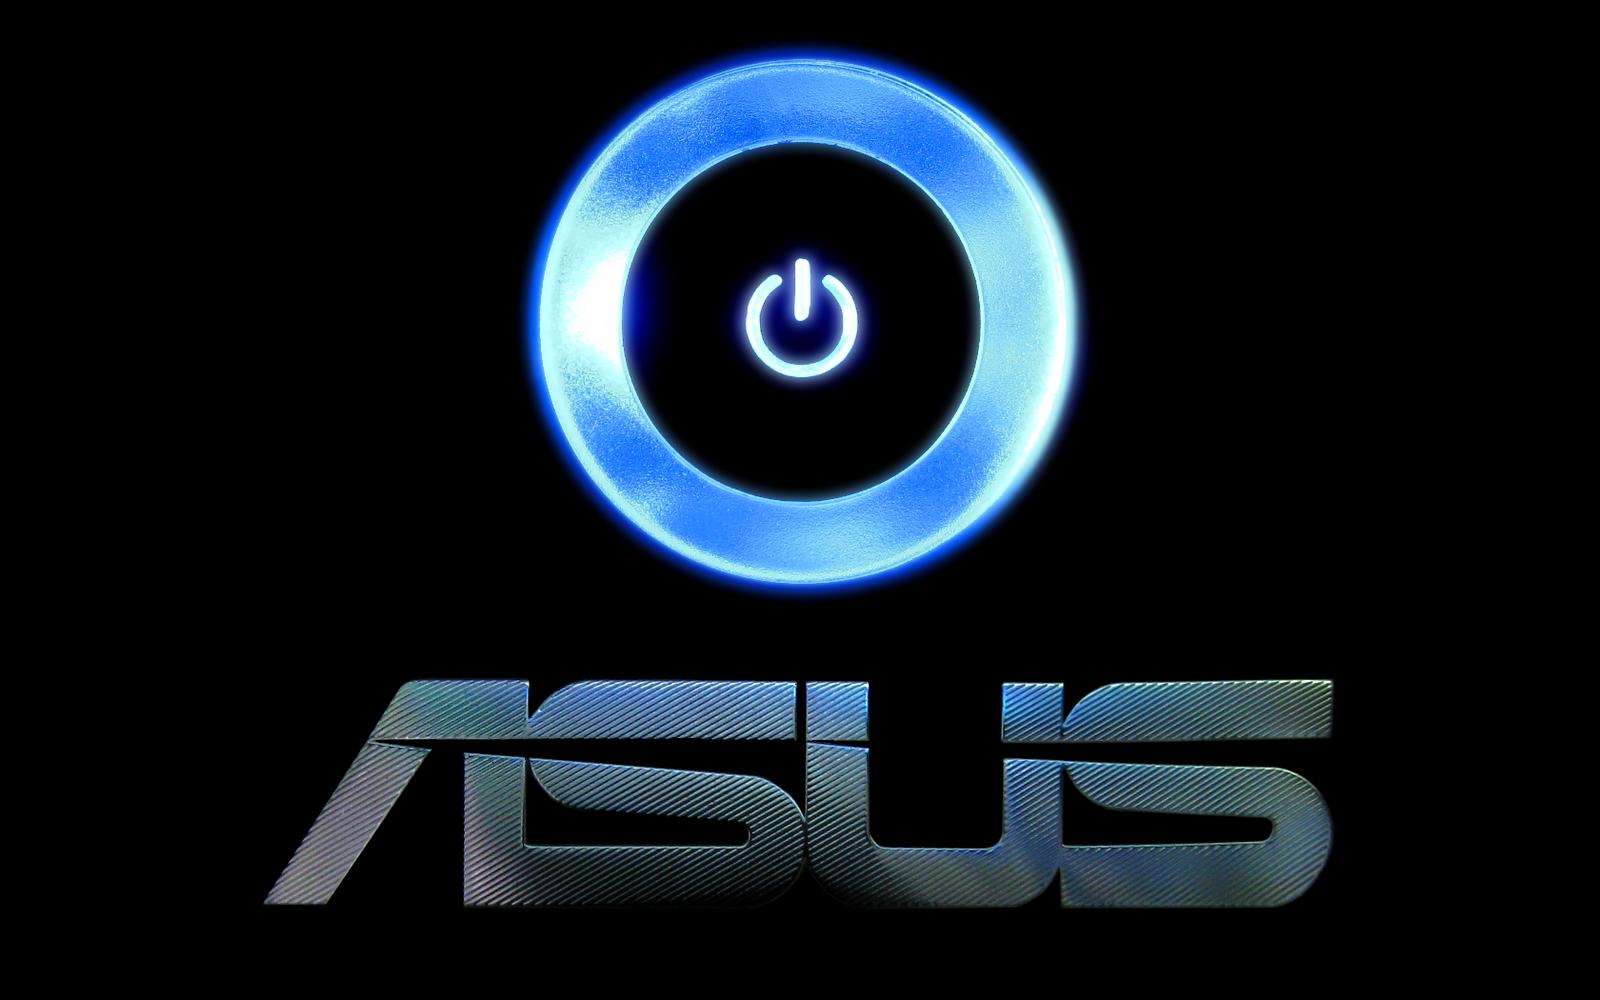 http://3.bp.blogspot.com/-HdalbKWD-xY/TceQpZGYBVI/AAAAAAAABOU/e38orTMZKIk/s1600/Asus_Wide_Wallpaper_Logo_by_biffexploder.png